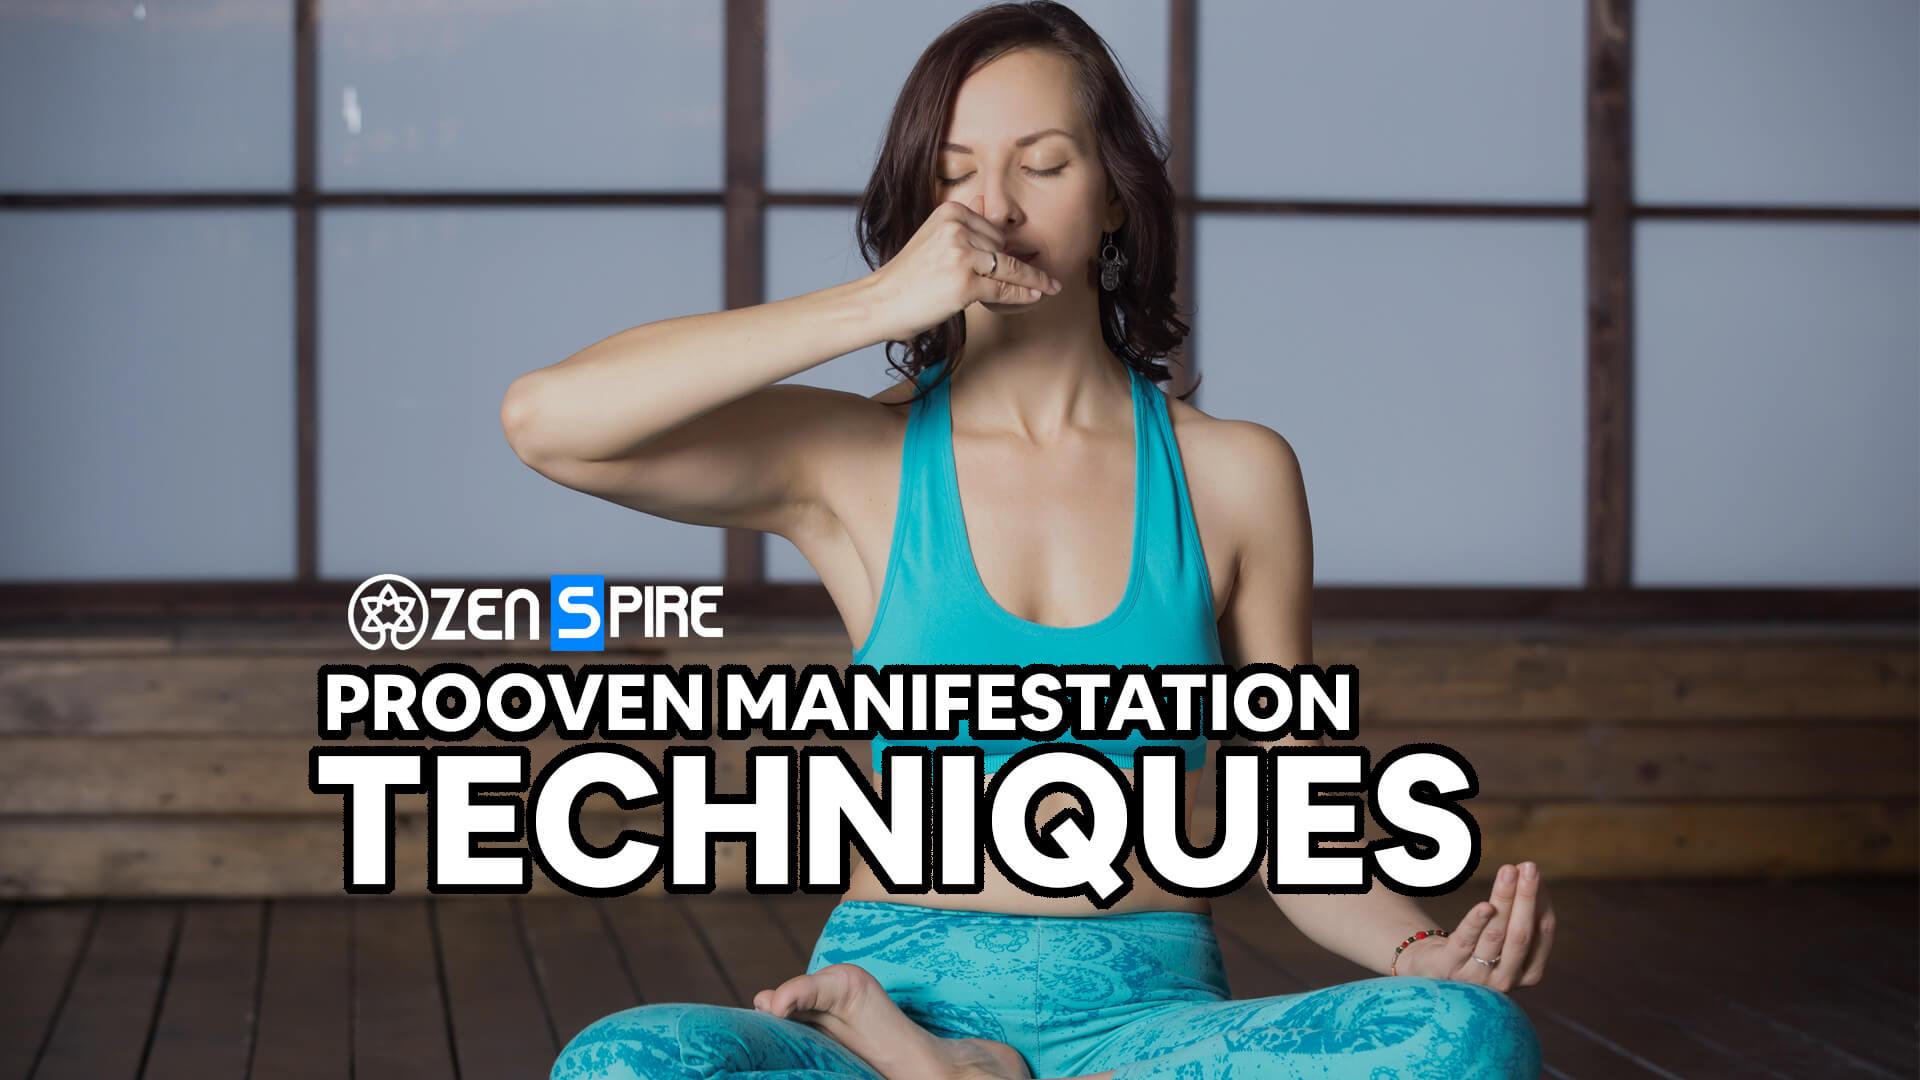 Manifestation Techniques by Zenspiree